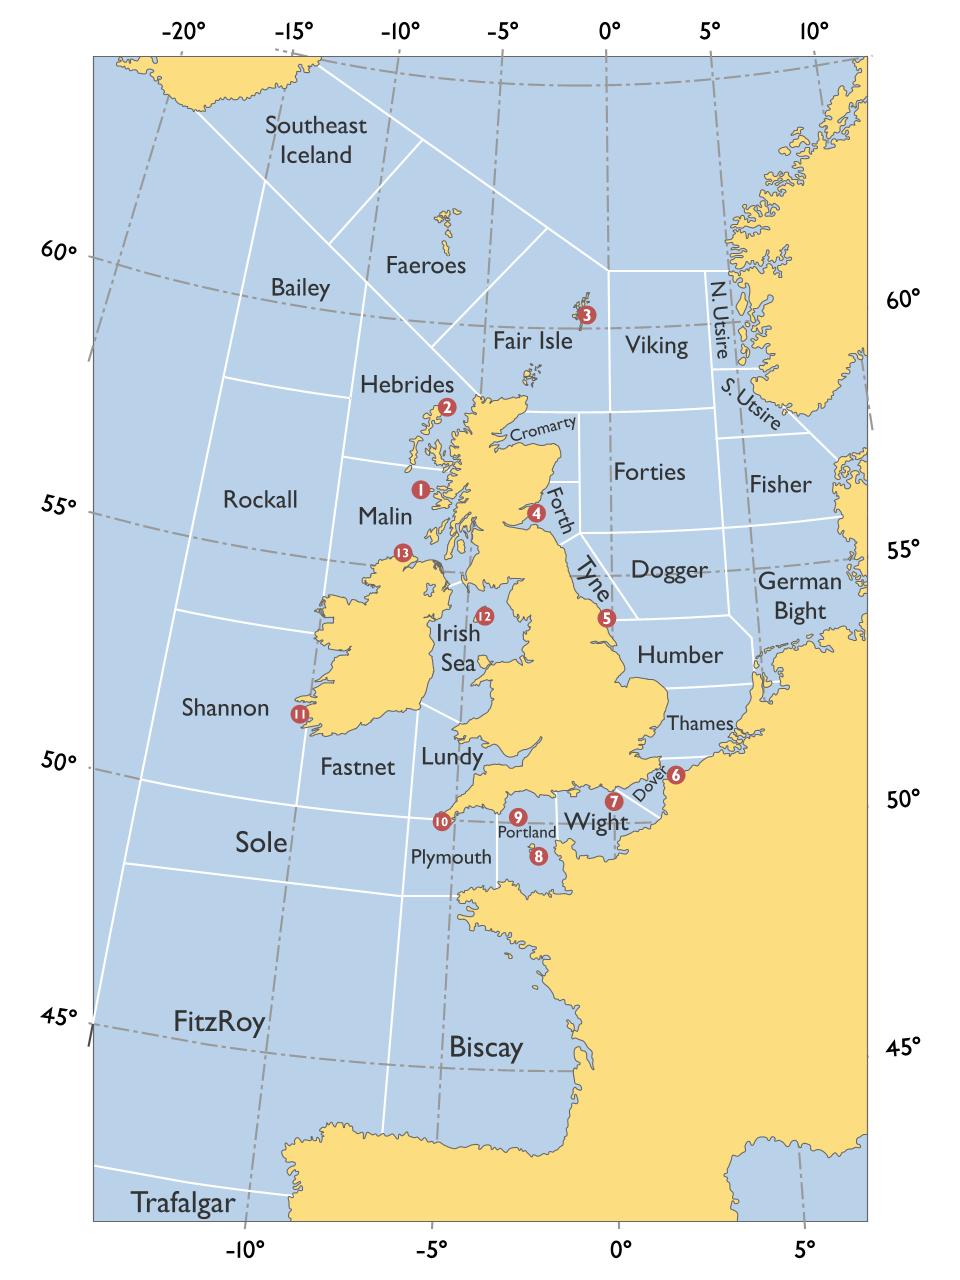 Shipping Forecast Region Names